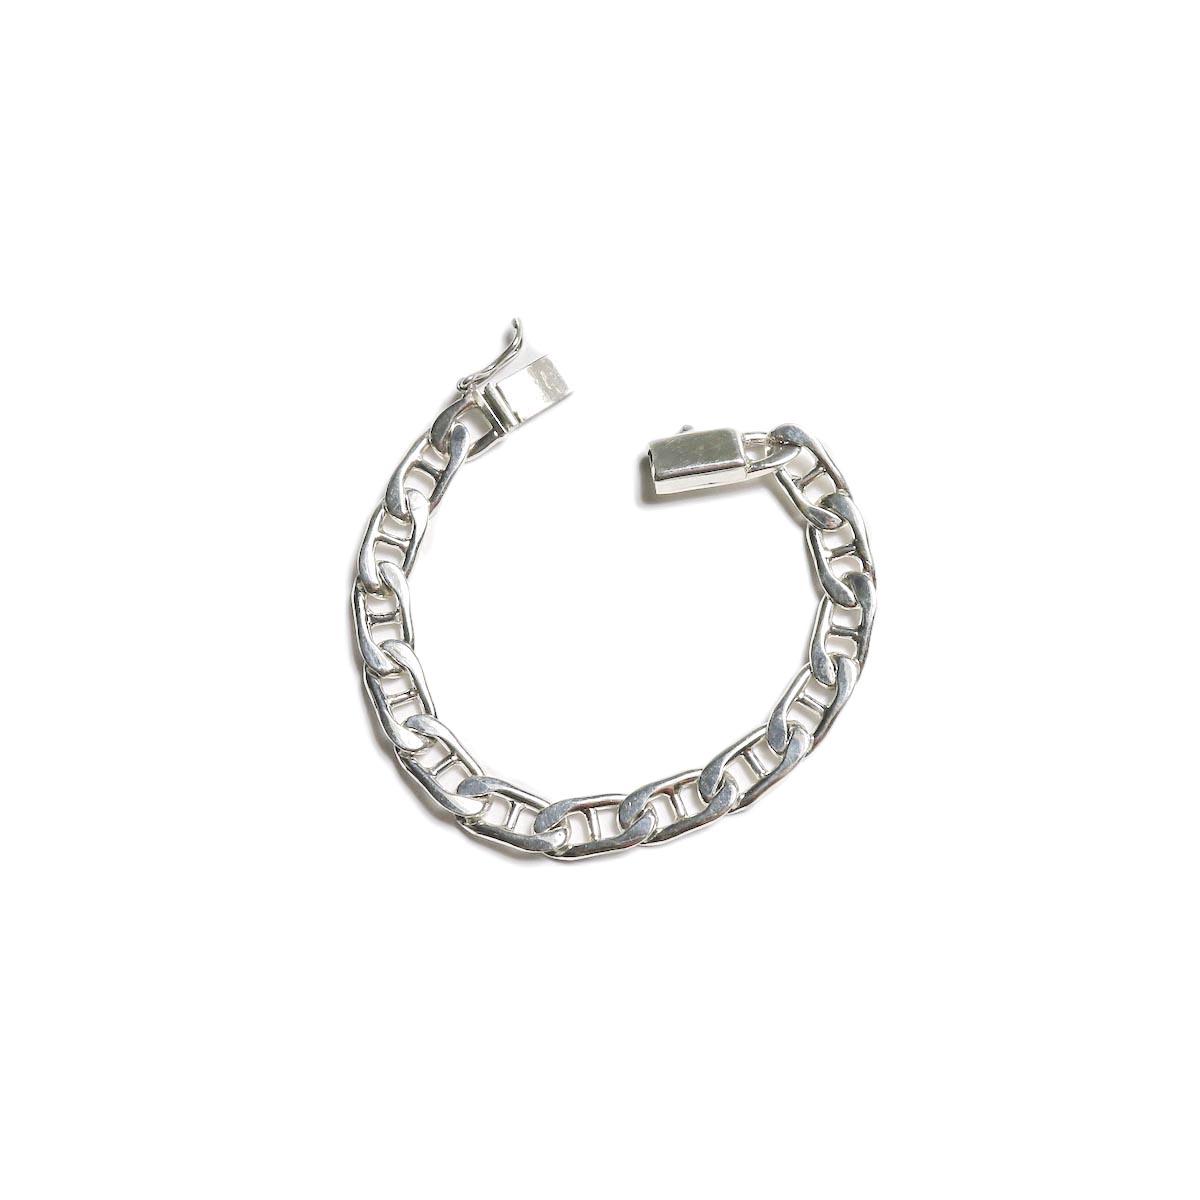 FIFTH SILVER / silver-1490-1 Silver Chain Bracelet (8mm)